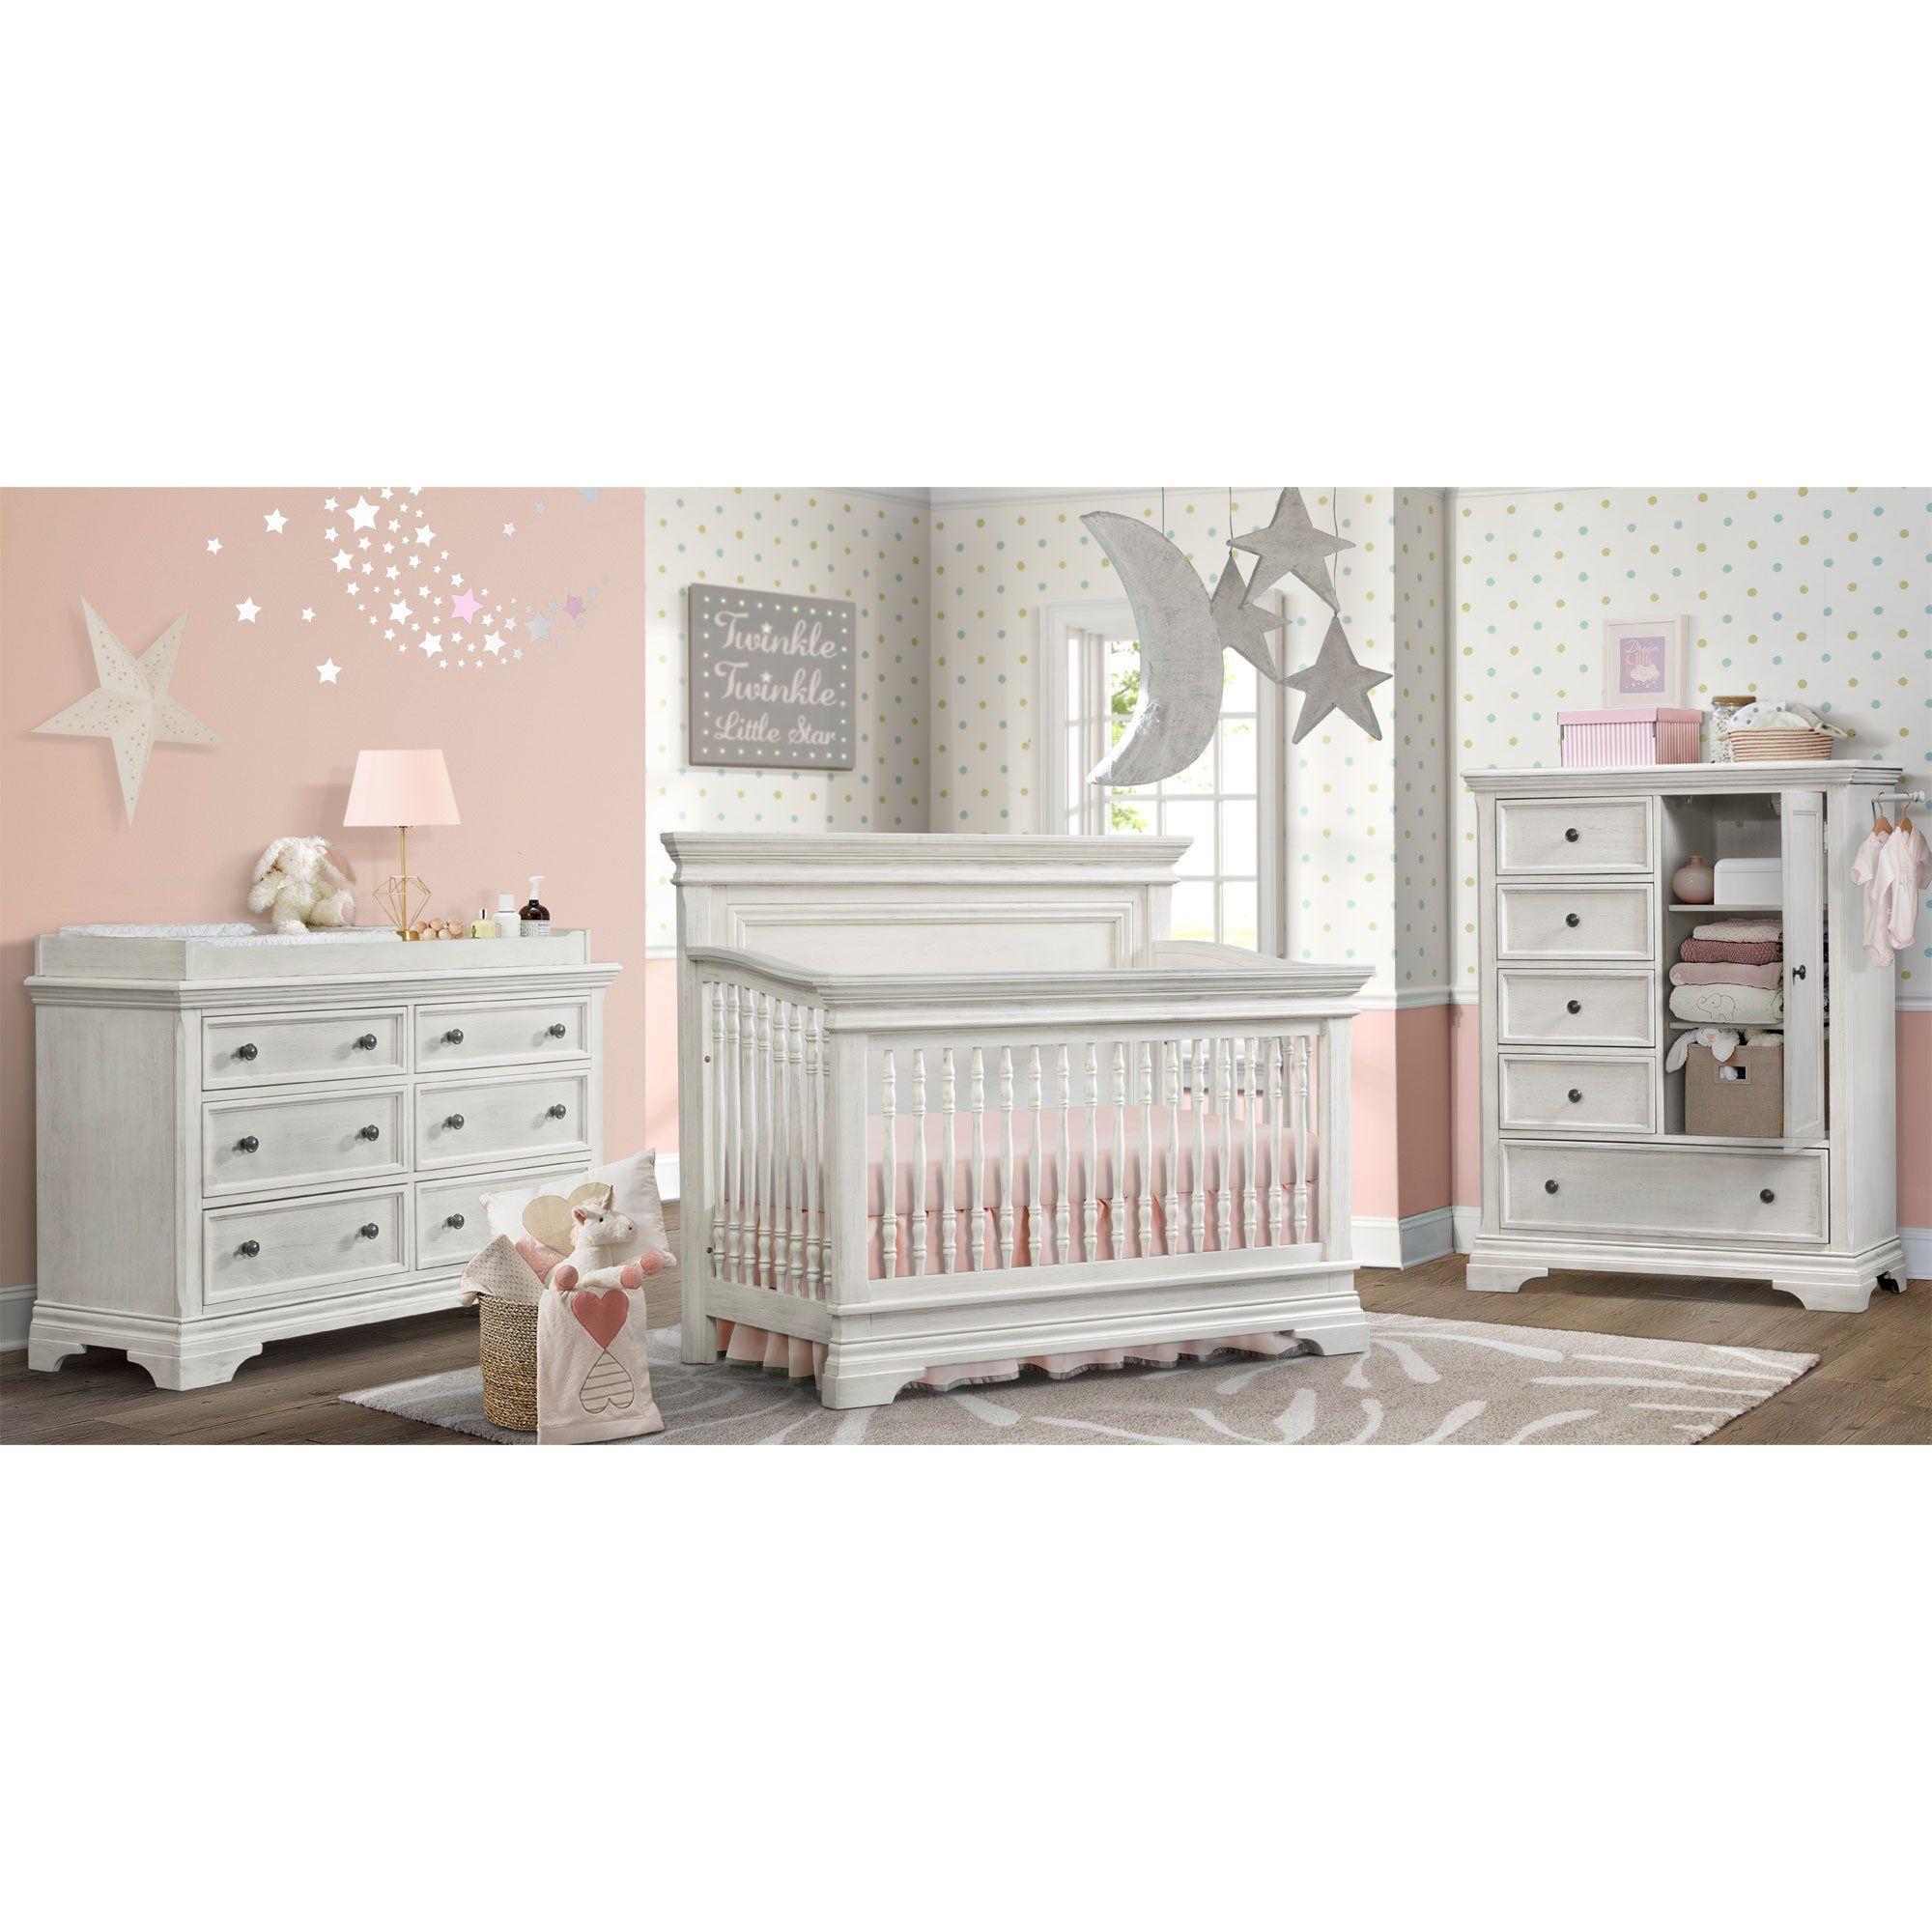 Traditional White 4 Piece Nursery Furniture Set Olivia In 2020 With Images Nursery Furniture Sets Bedroom